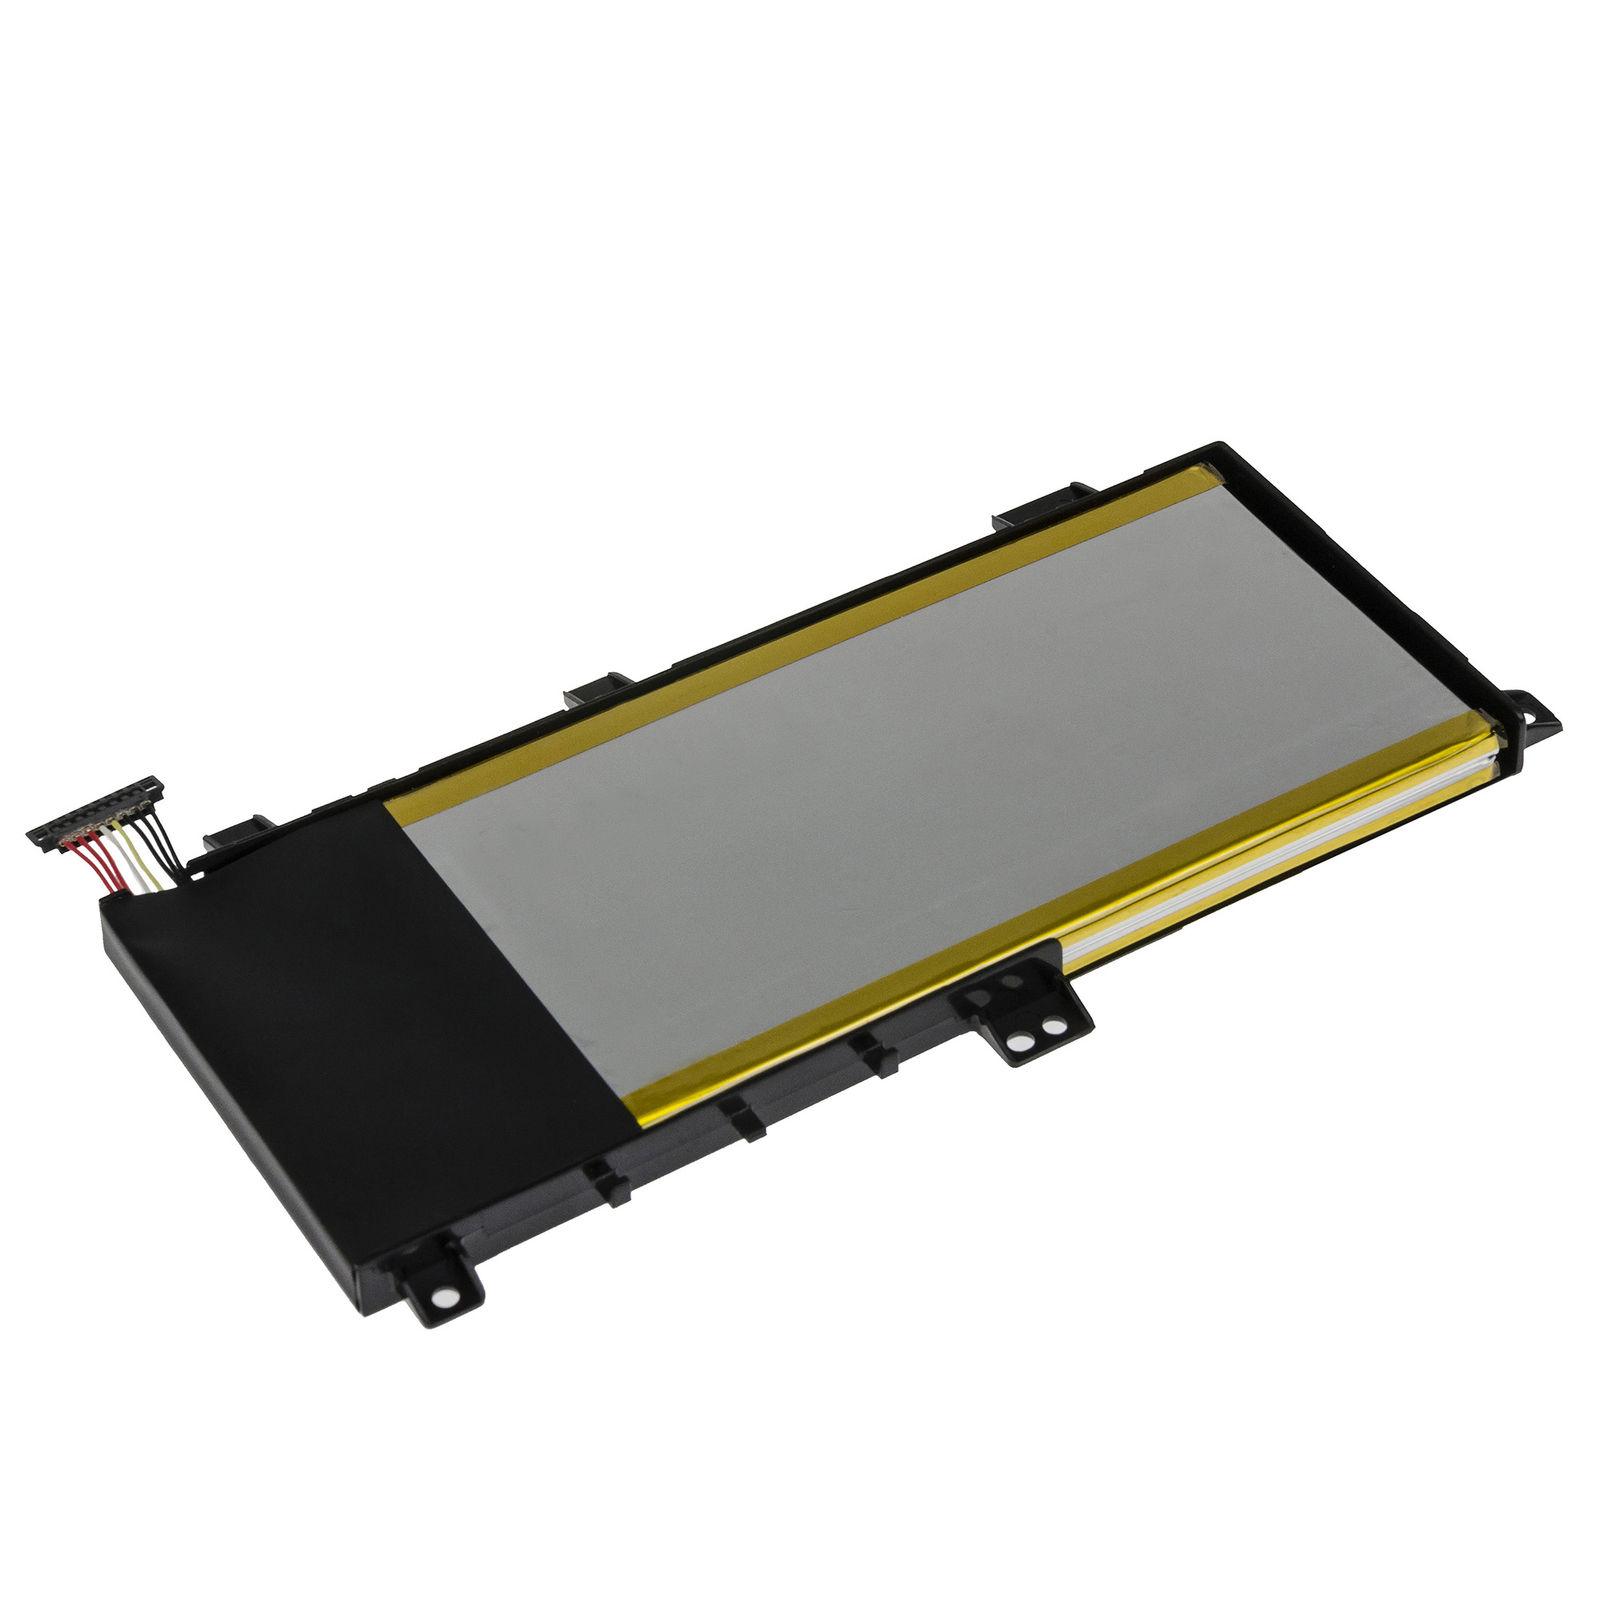 Akku für Asus Transformer Book Flip TP550LA-CJ004H TP550LA-CJ025H(Ersatz)